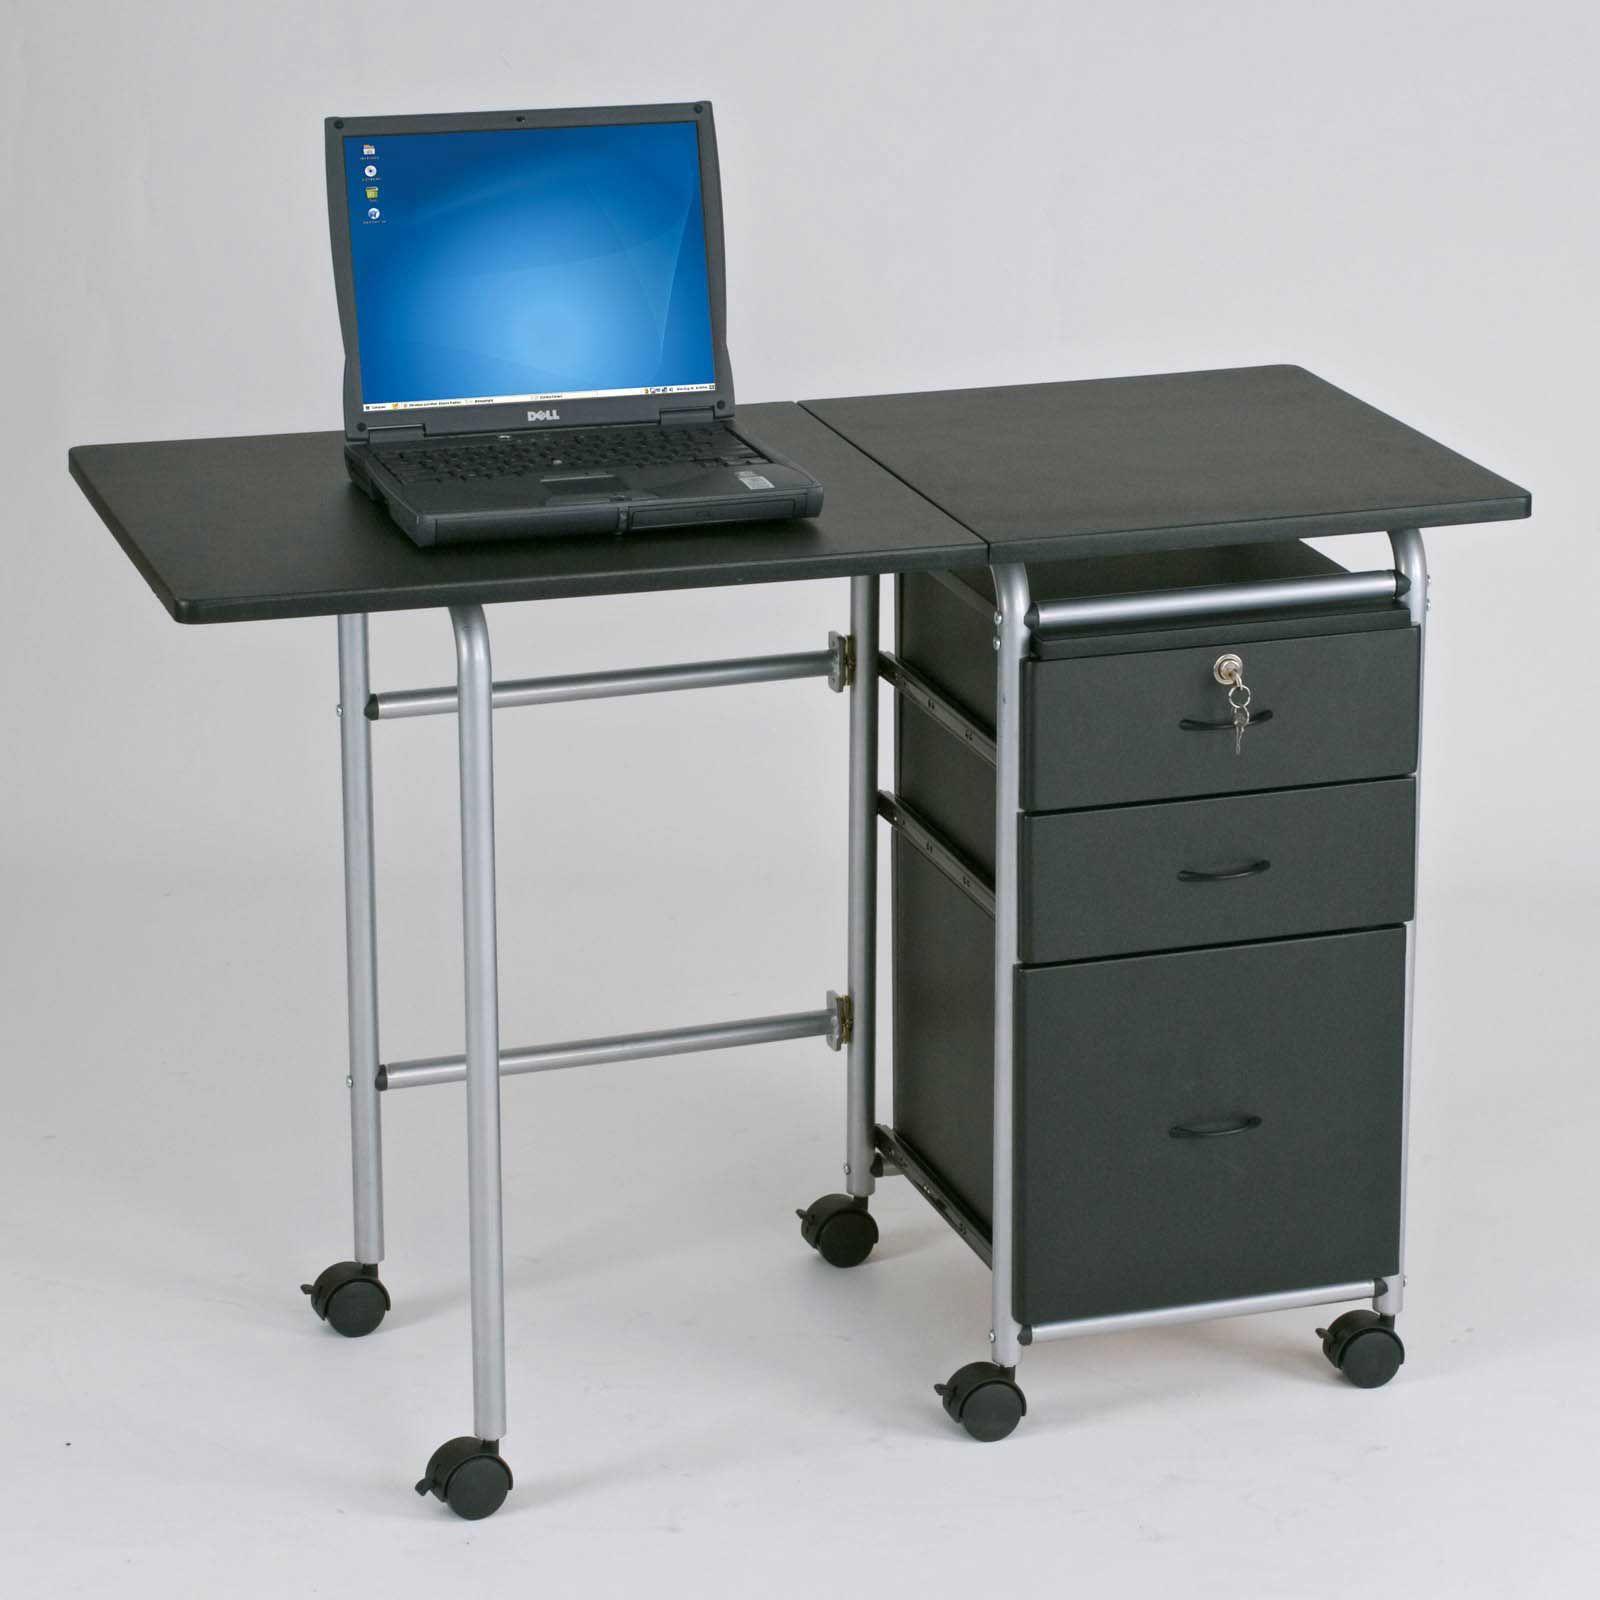 Looking for Computer Desks? Explore our selection of Computer Desks For  Sale & great deals on Desks at Hayneedle!